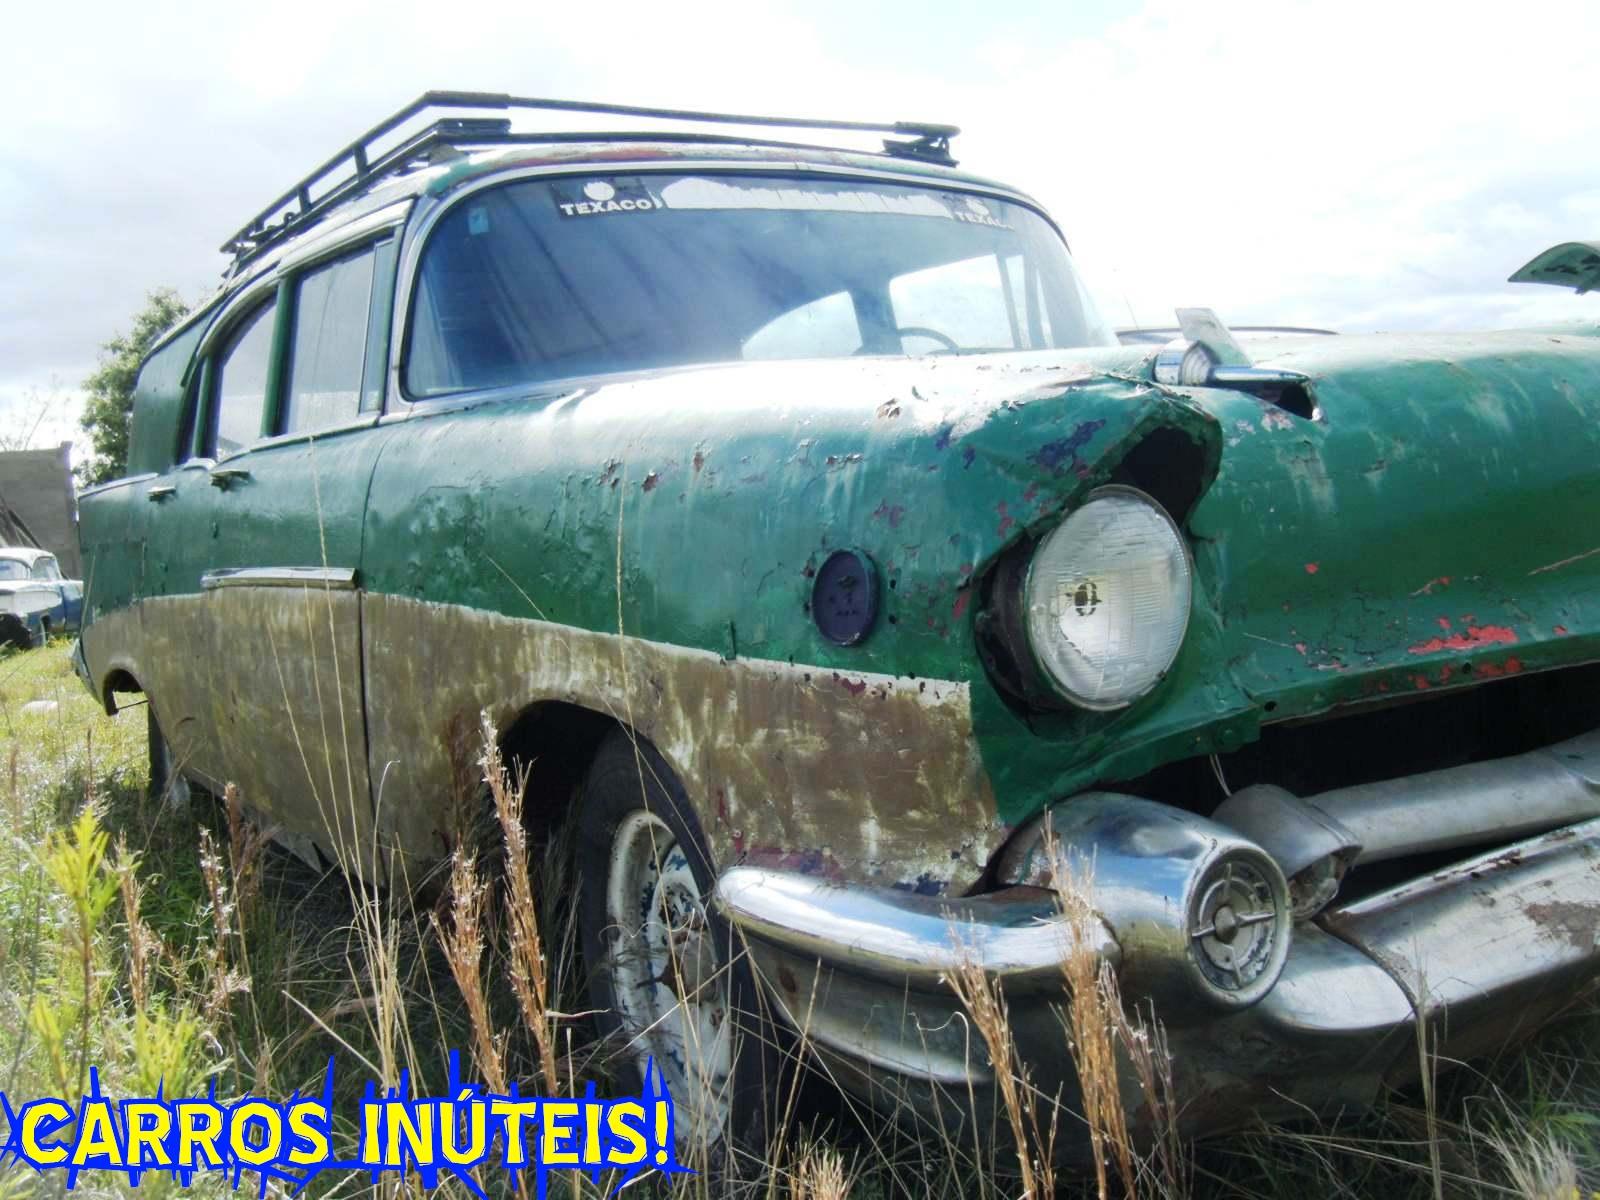 pablo-chevrolet-sw-1957-1 Chevrolet 1957 (SW original?)